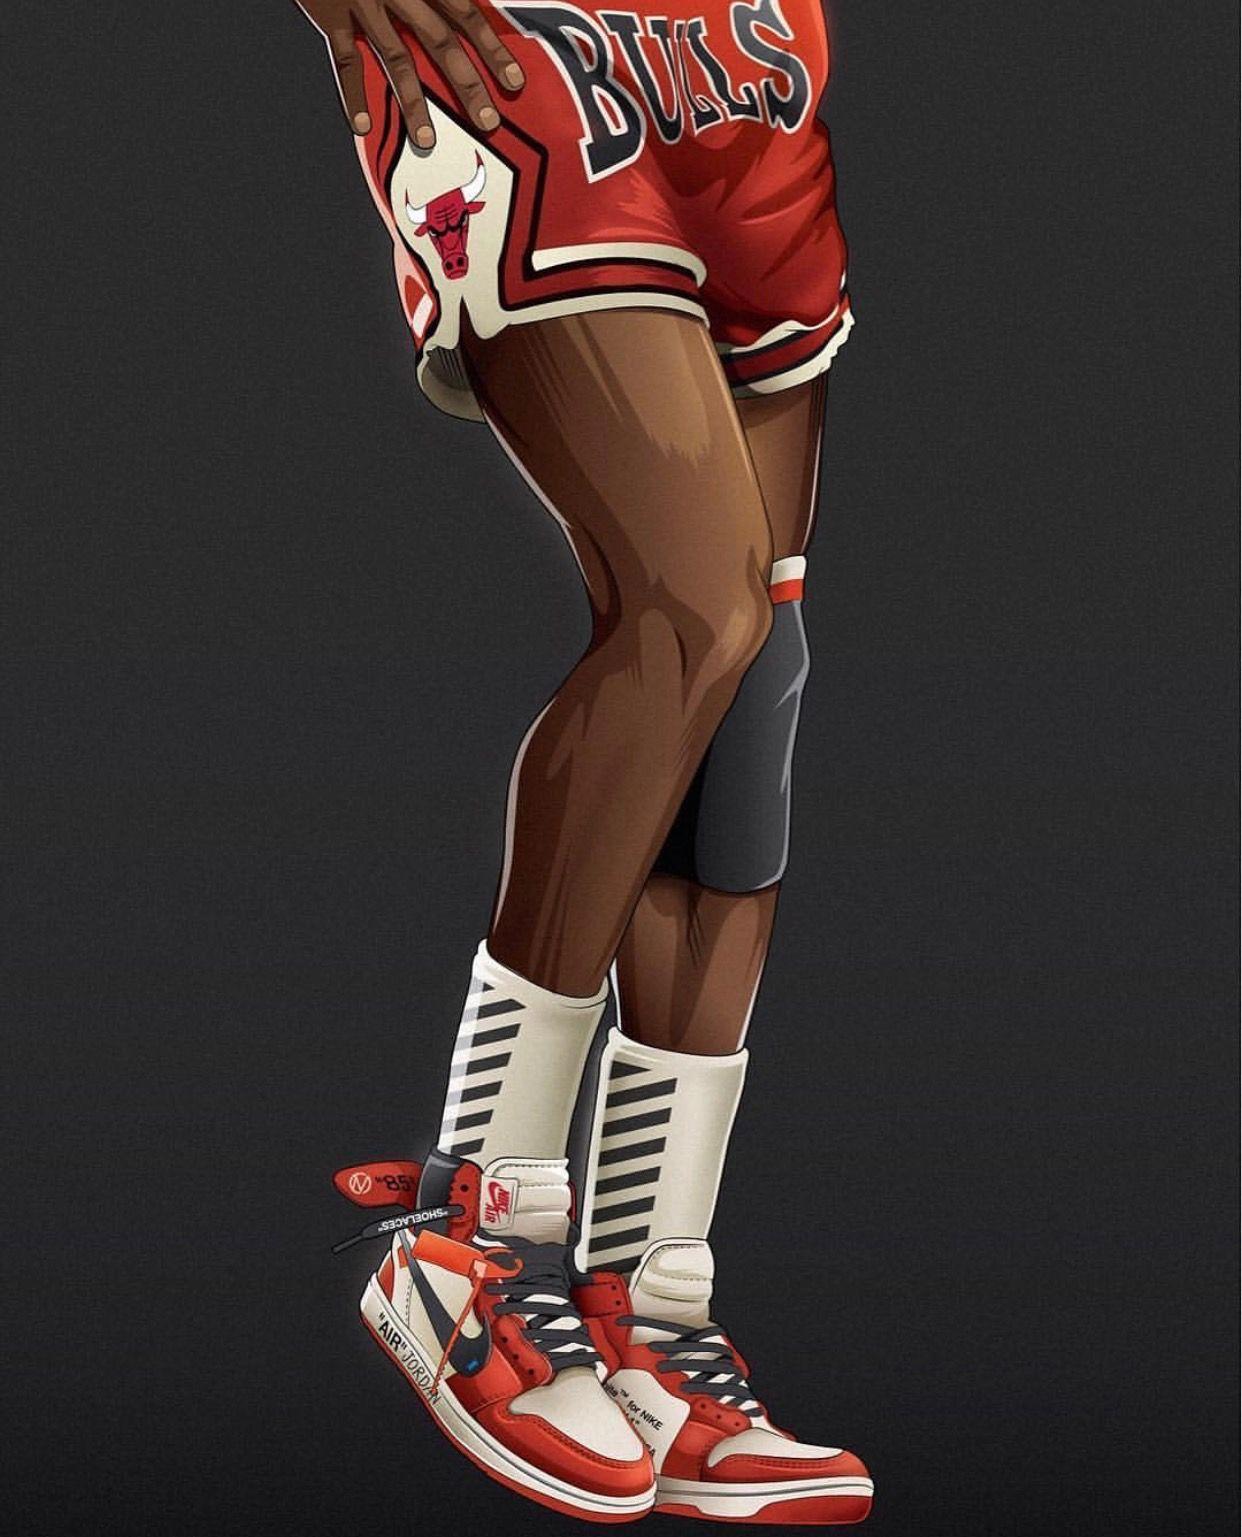 sports shoes 748c6 309d8 Air Jordan 1 Art